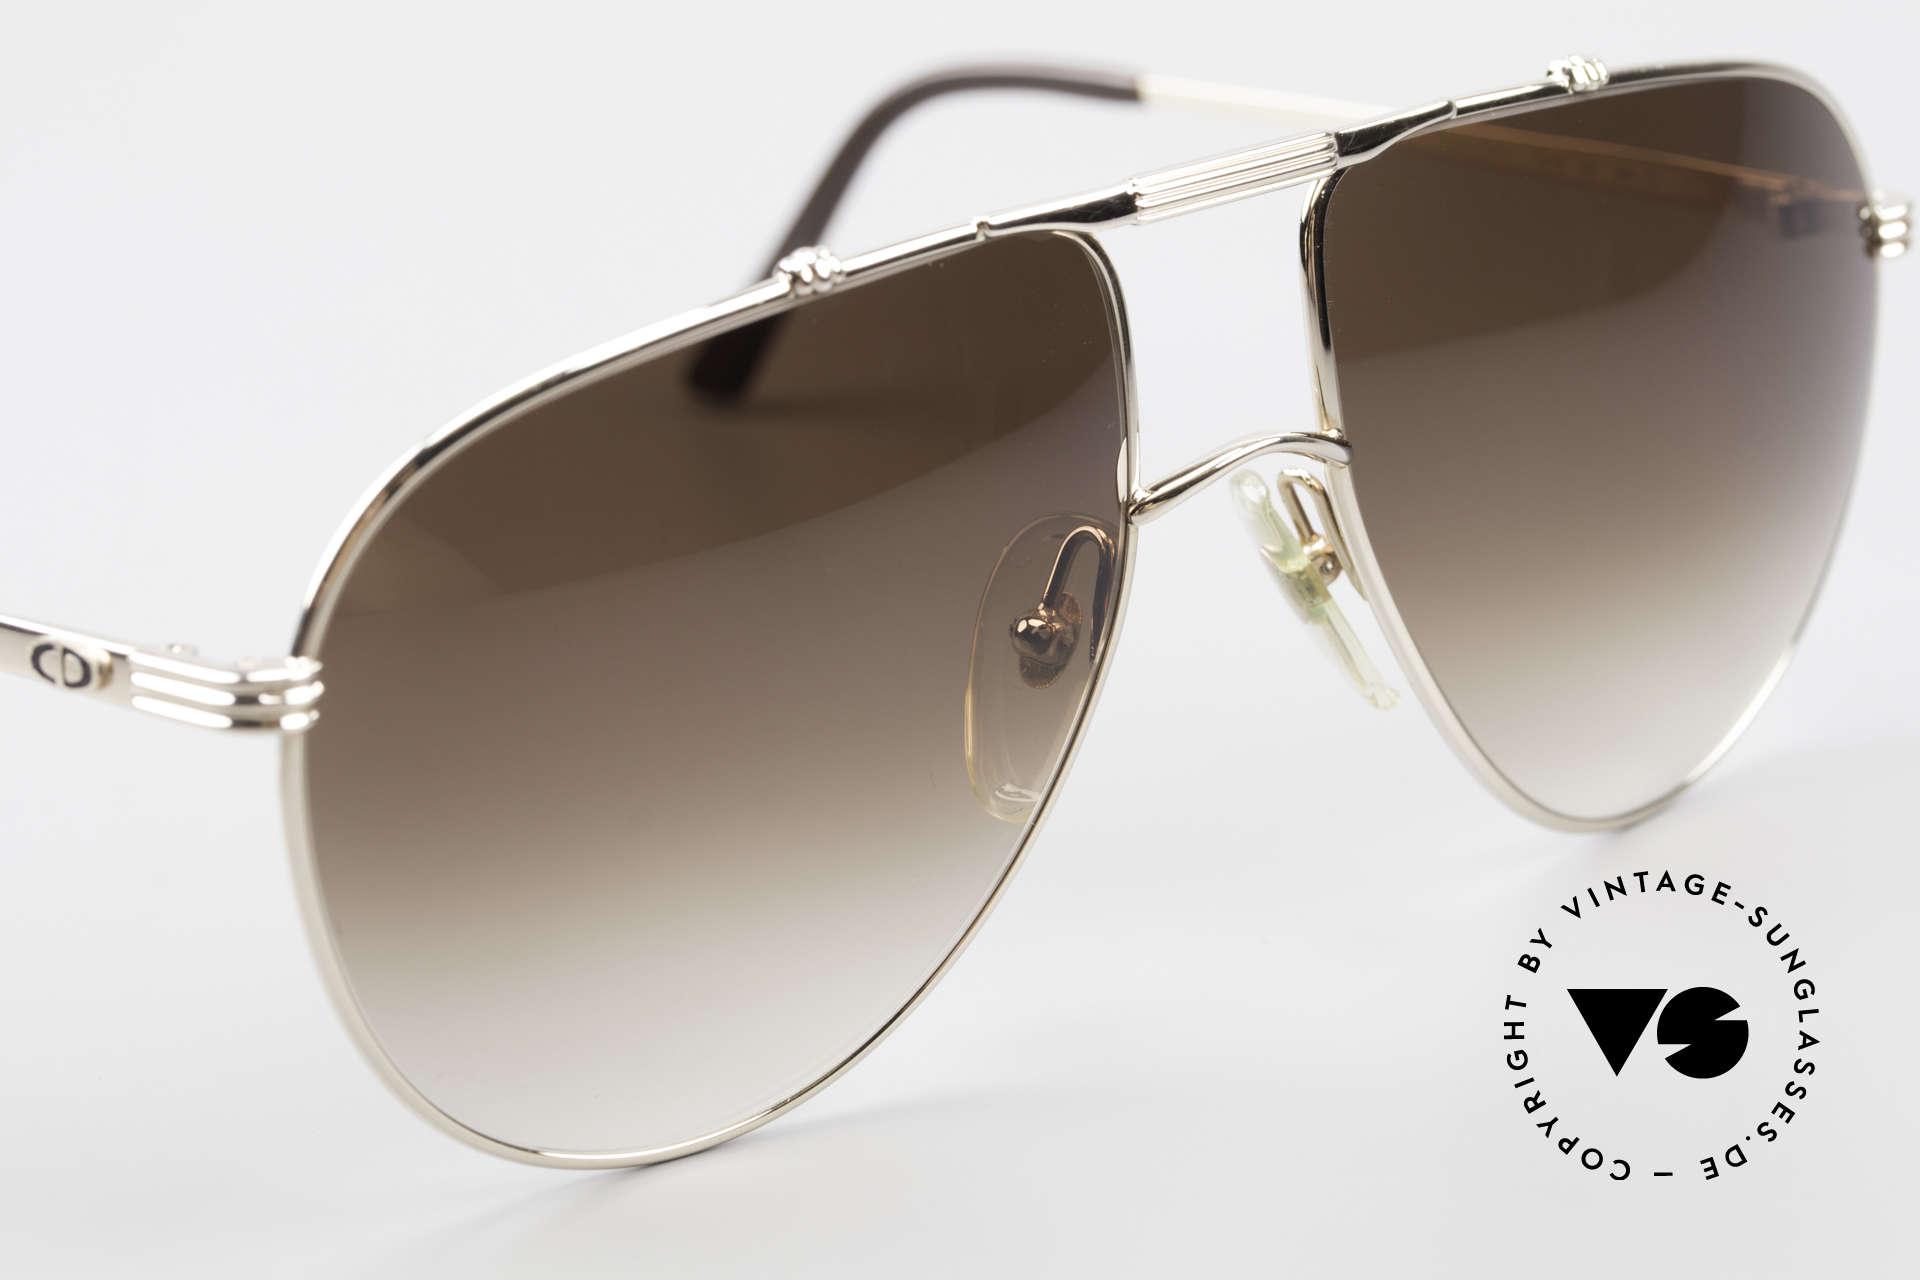 Christian Dior 2248 XL 80's Monsieur Sunglasses, NO RETRO SUNGLASSES; but a 30 years old ORIGINAL, Made for Men